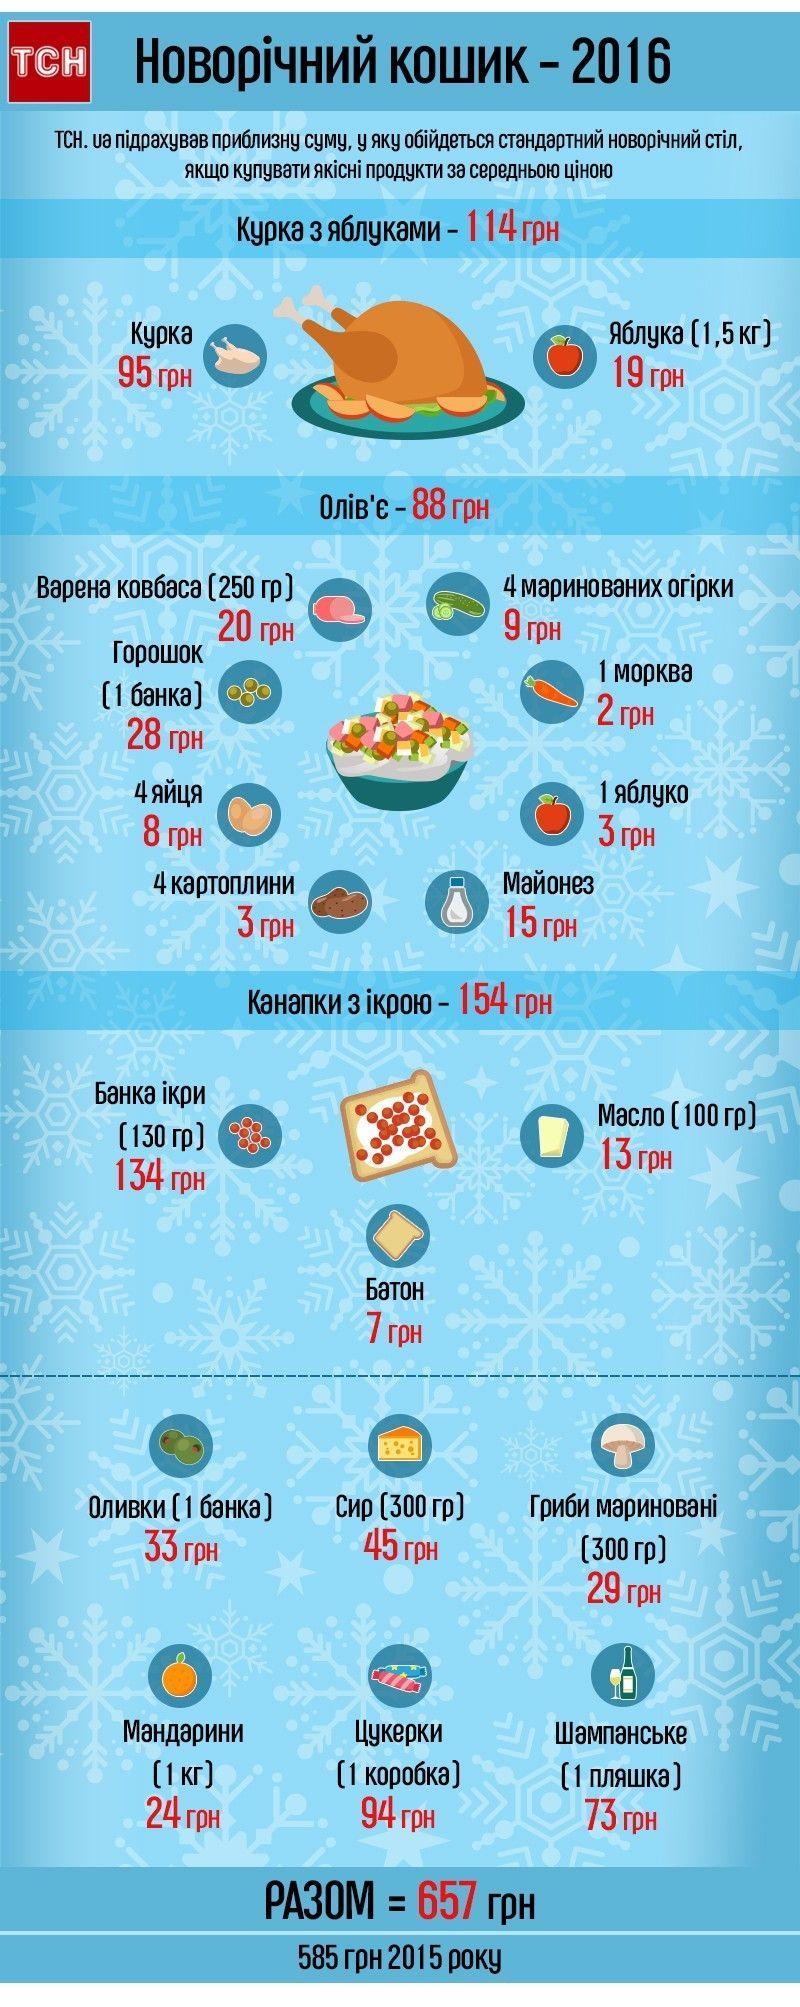 Инфографика / tsn.ua